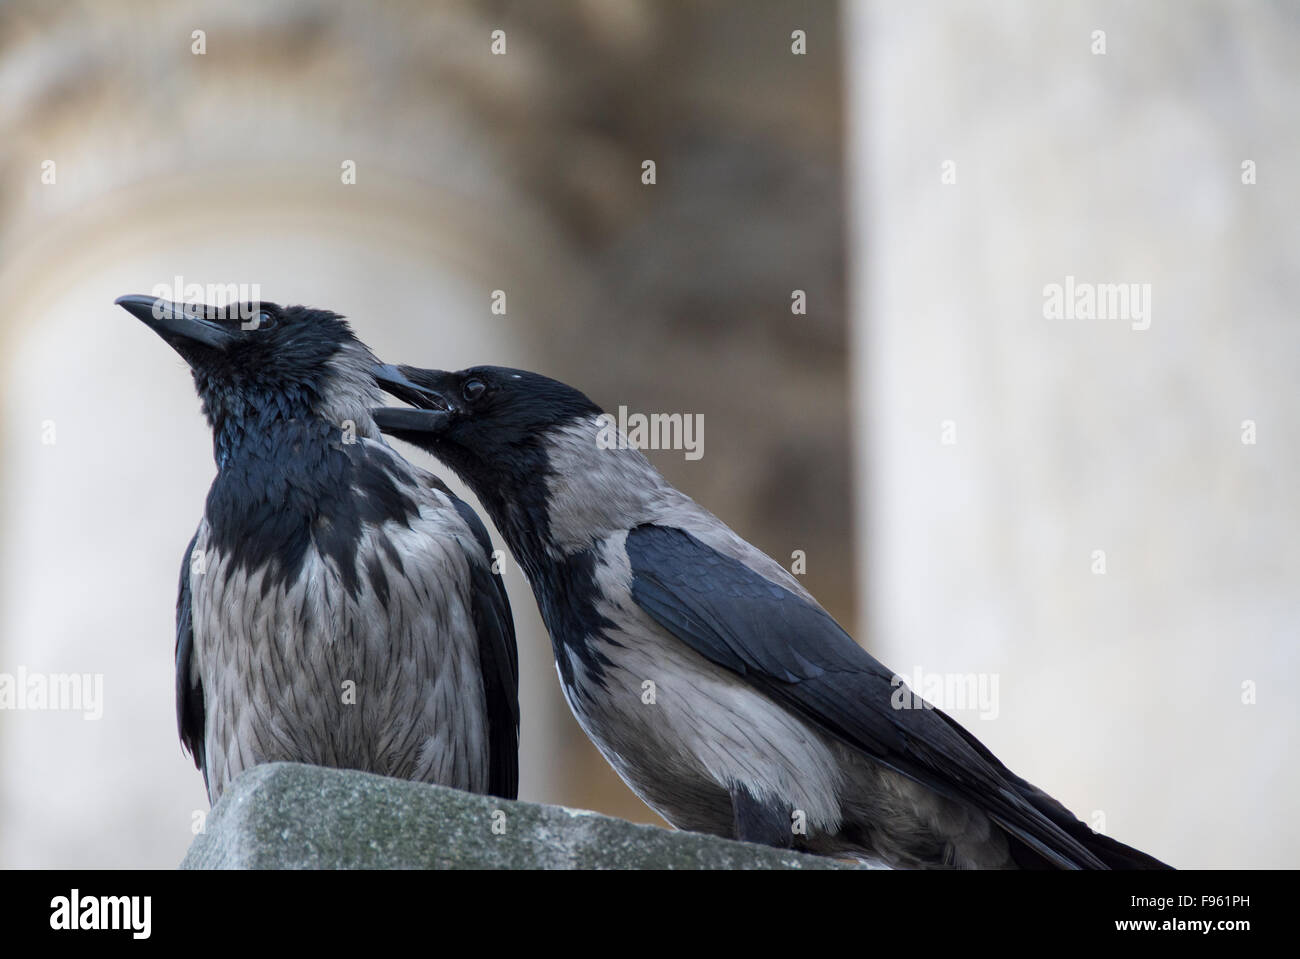 The hooded crow (Corvus cornix), a Eurasian bird species in the crow genus. Berlin, Germany - Stock Image